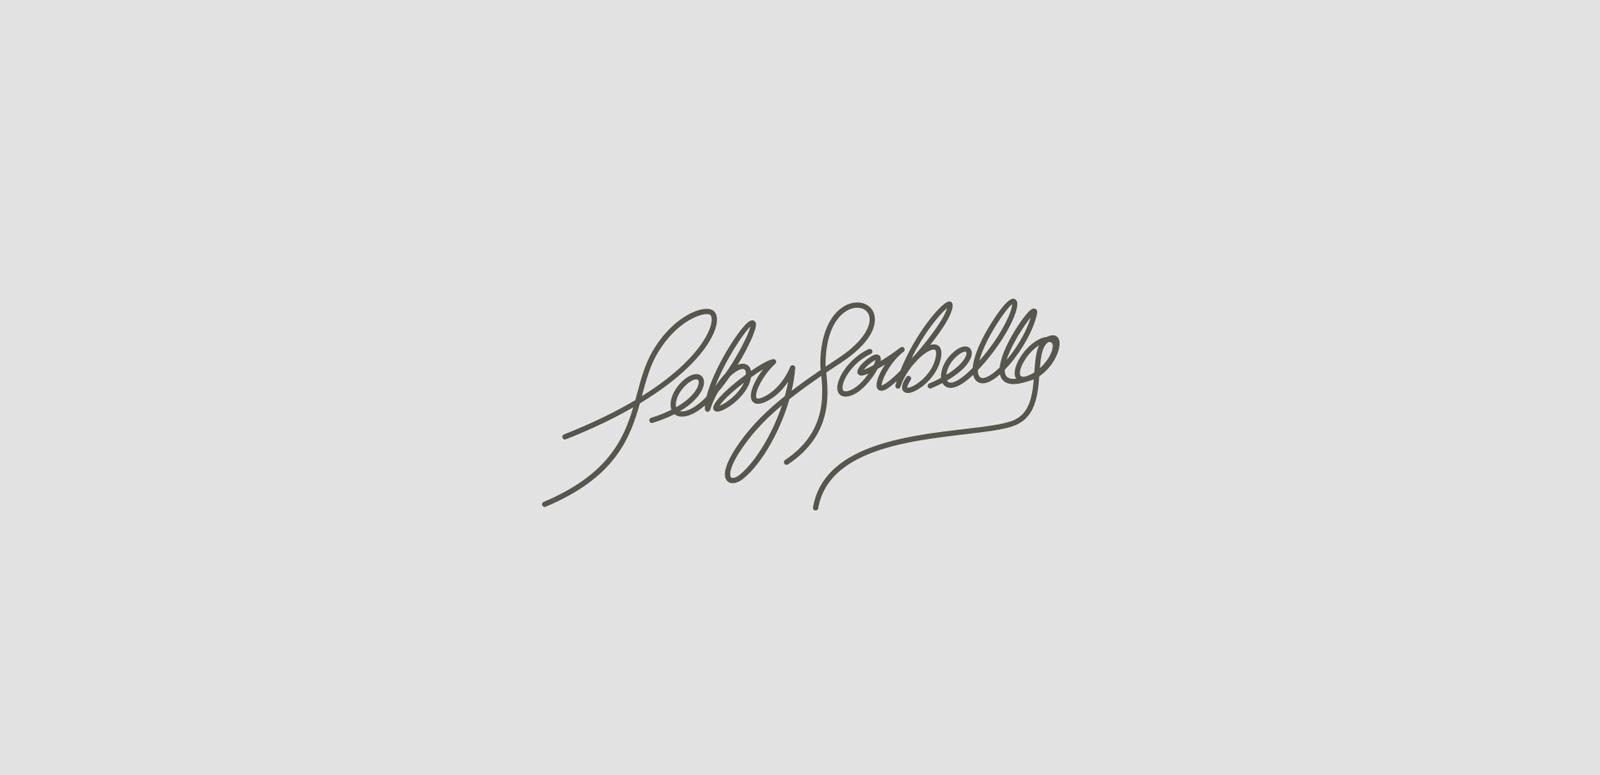 La Cook Branding Seby Sorbello